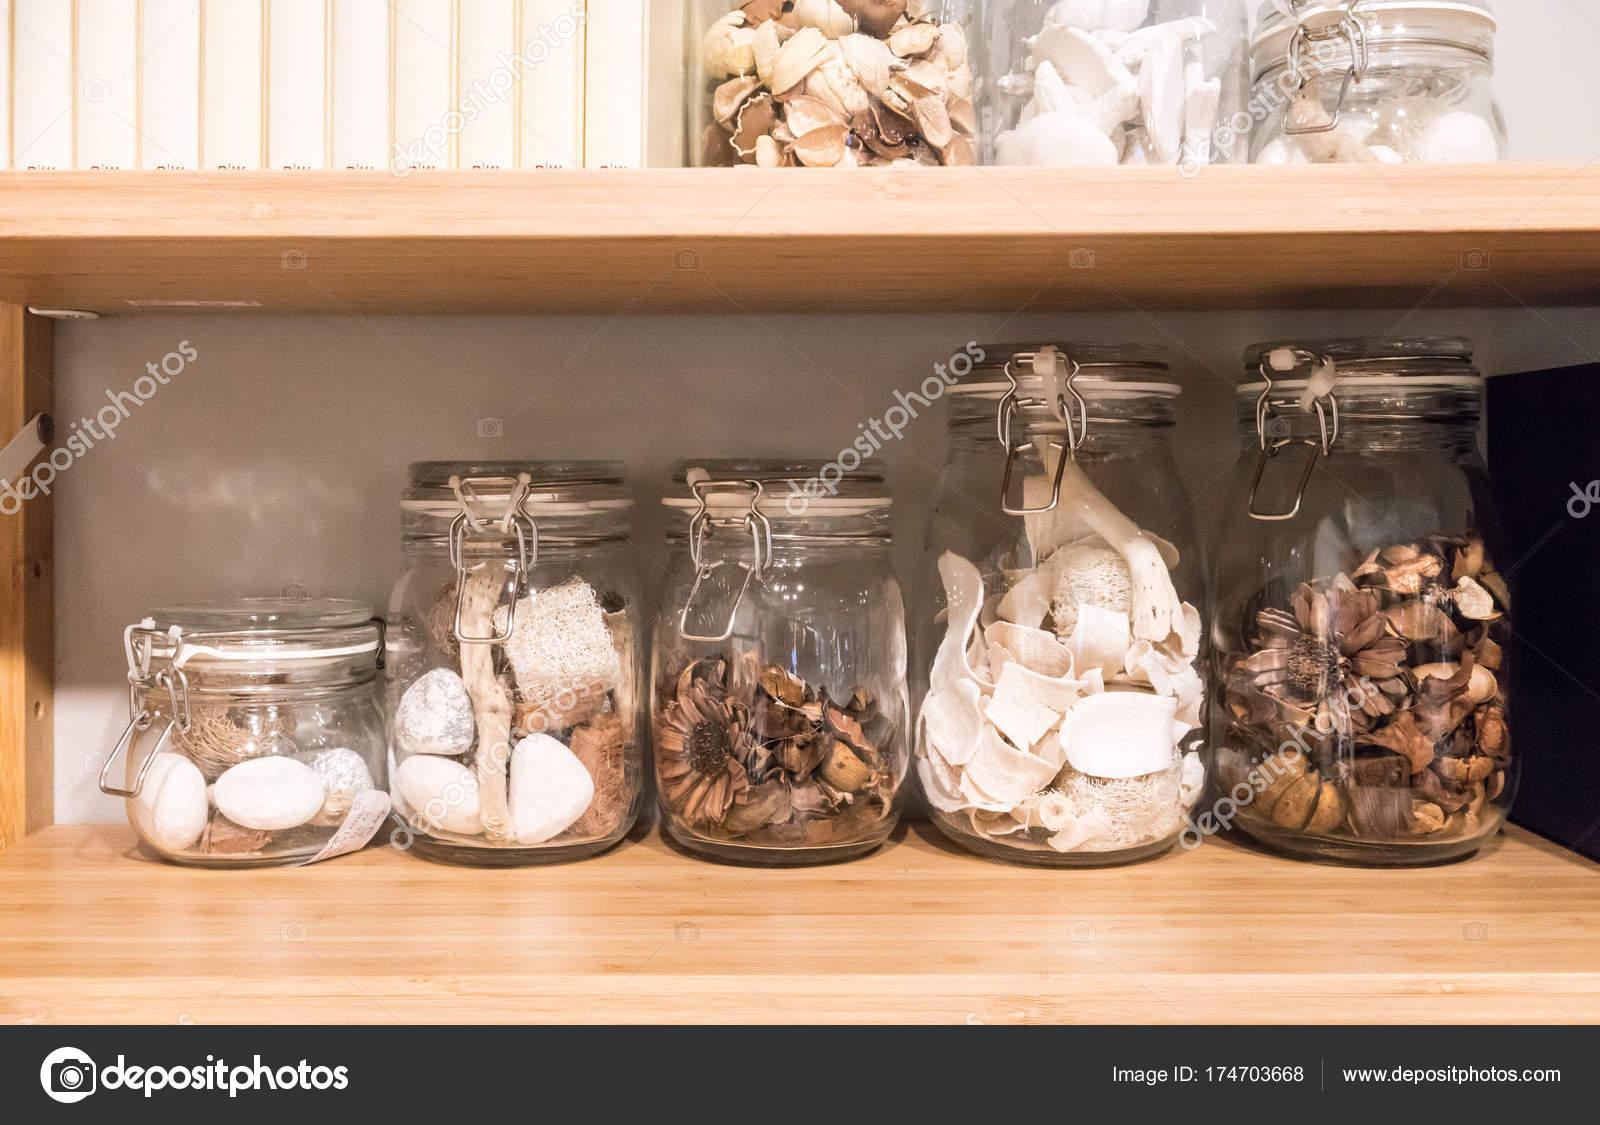 coral kitchen decor lantern lighting 家居装饰用玻璃罐中的干天然植物和珊瑚 图库照片 c v74 174703668